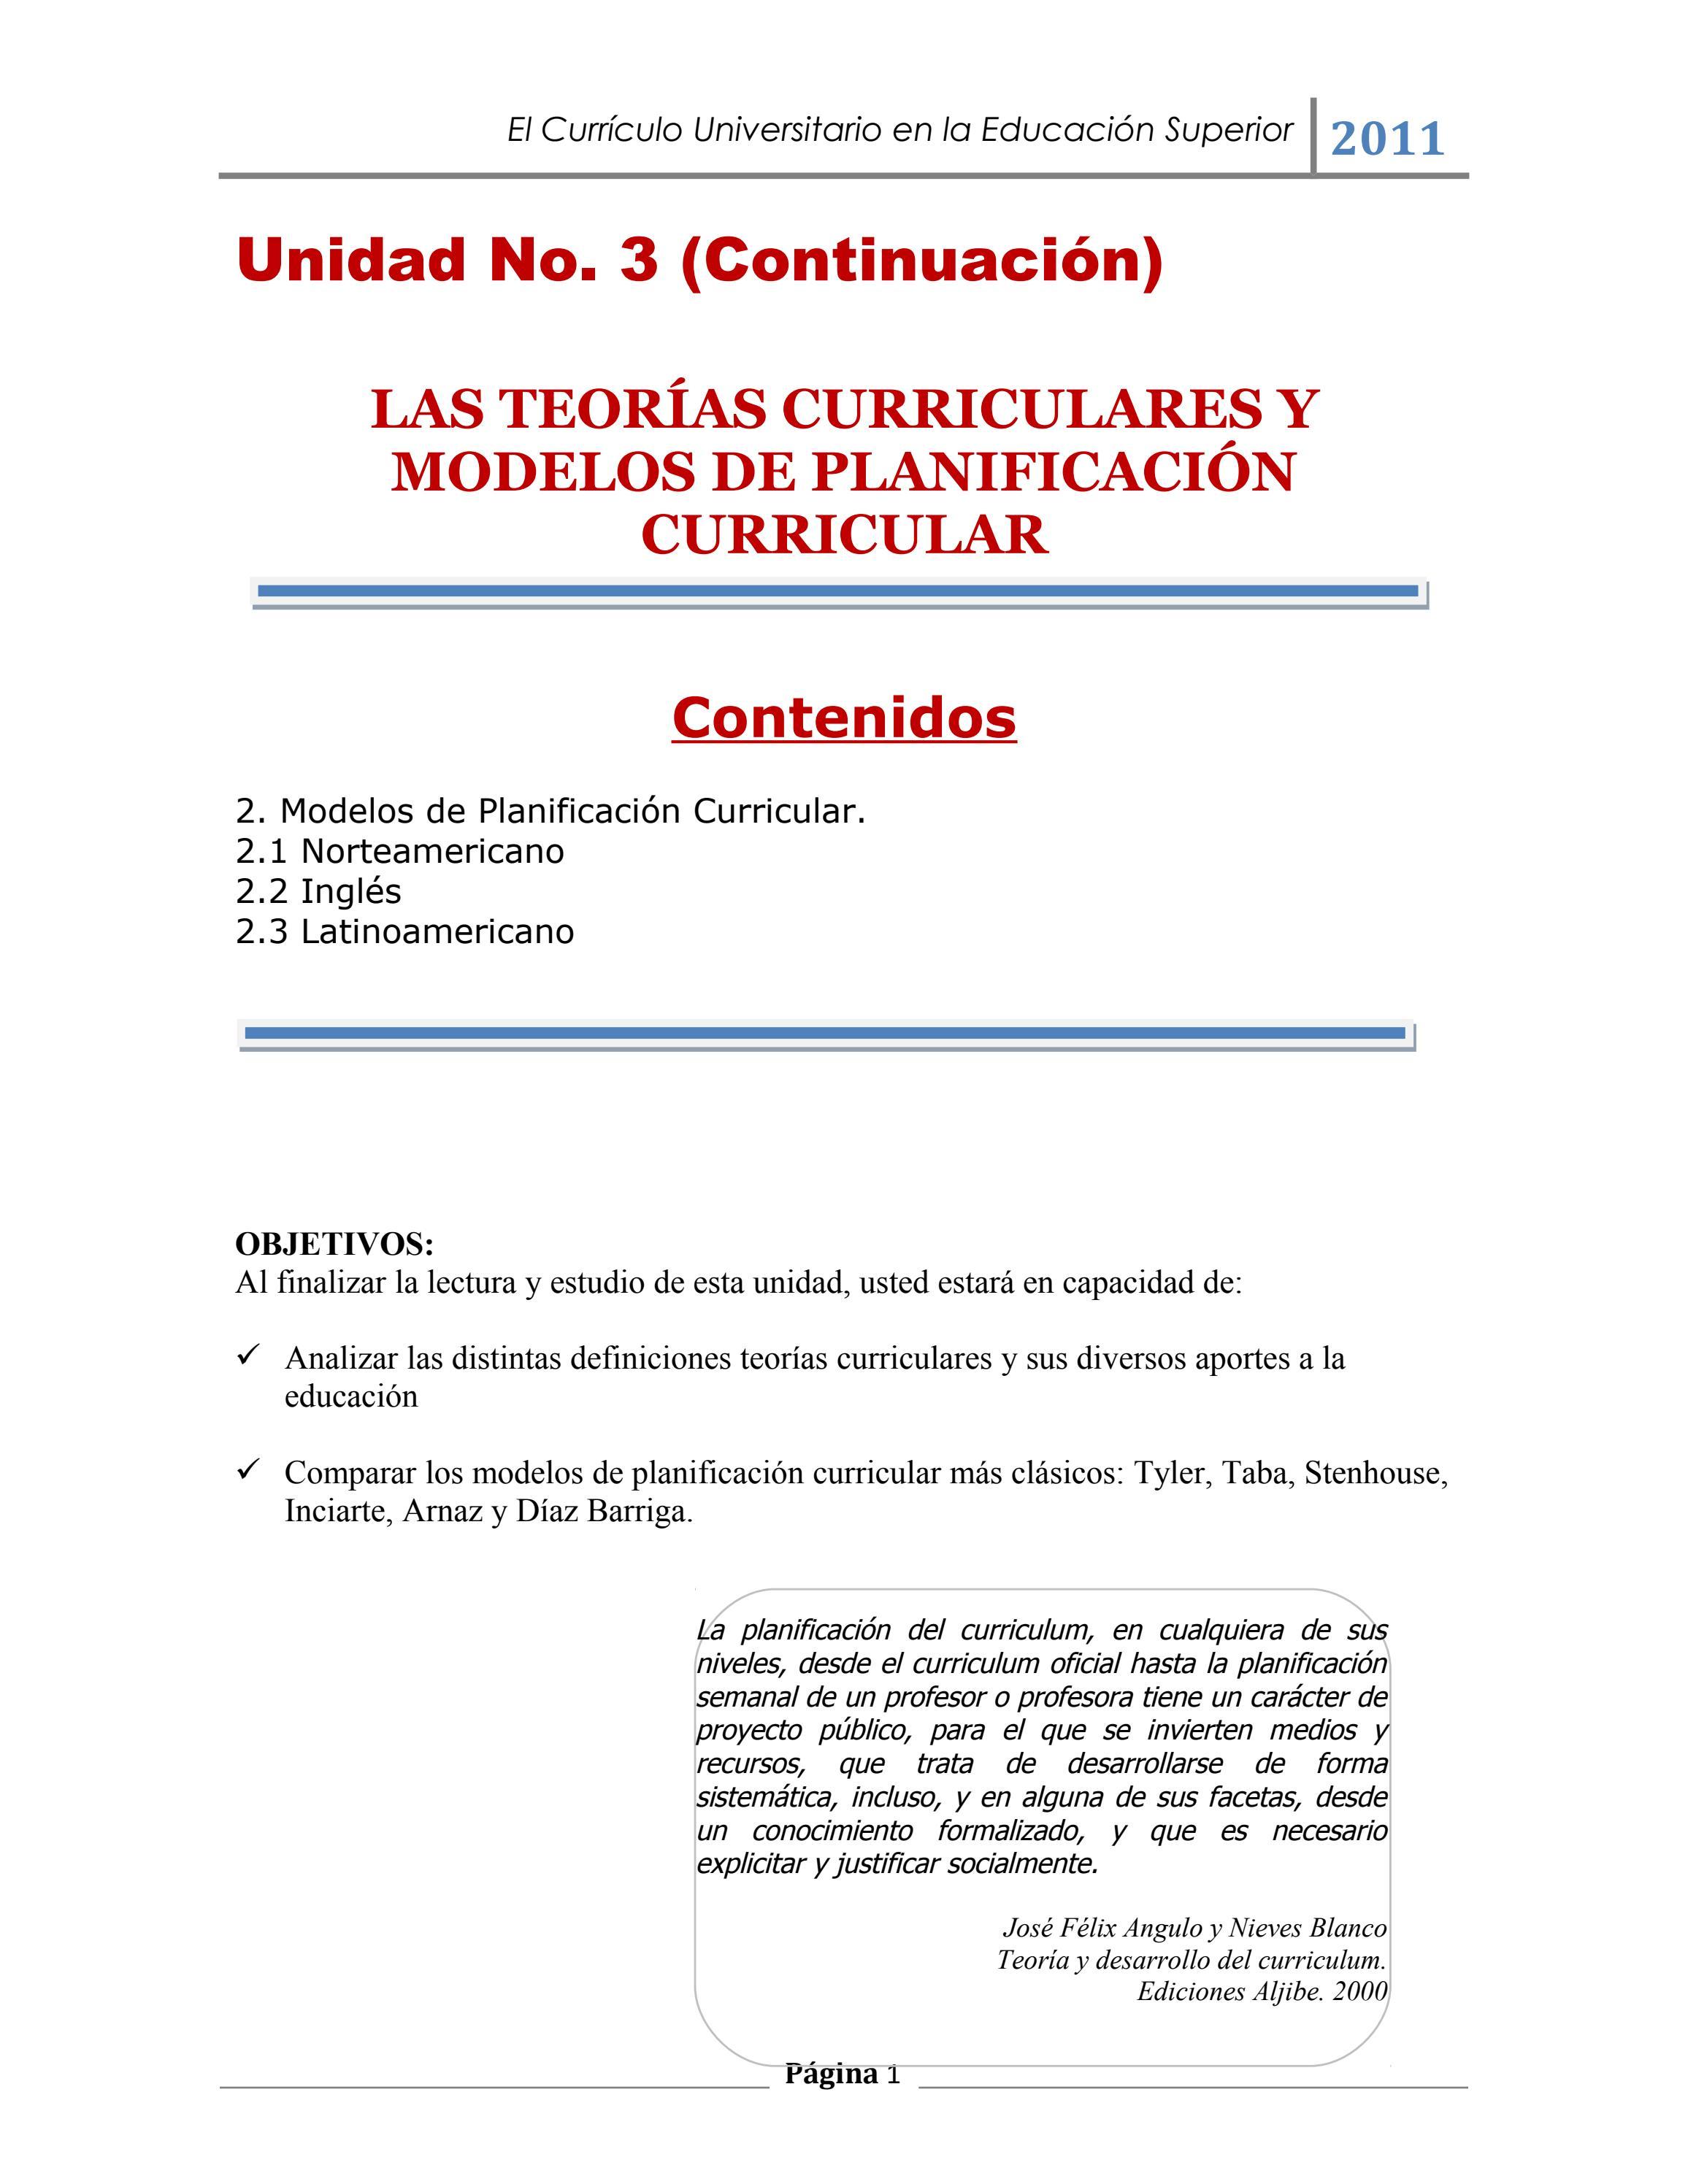 teorias curriculares by Daniel Calvillo - issuu